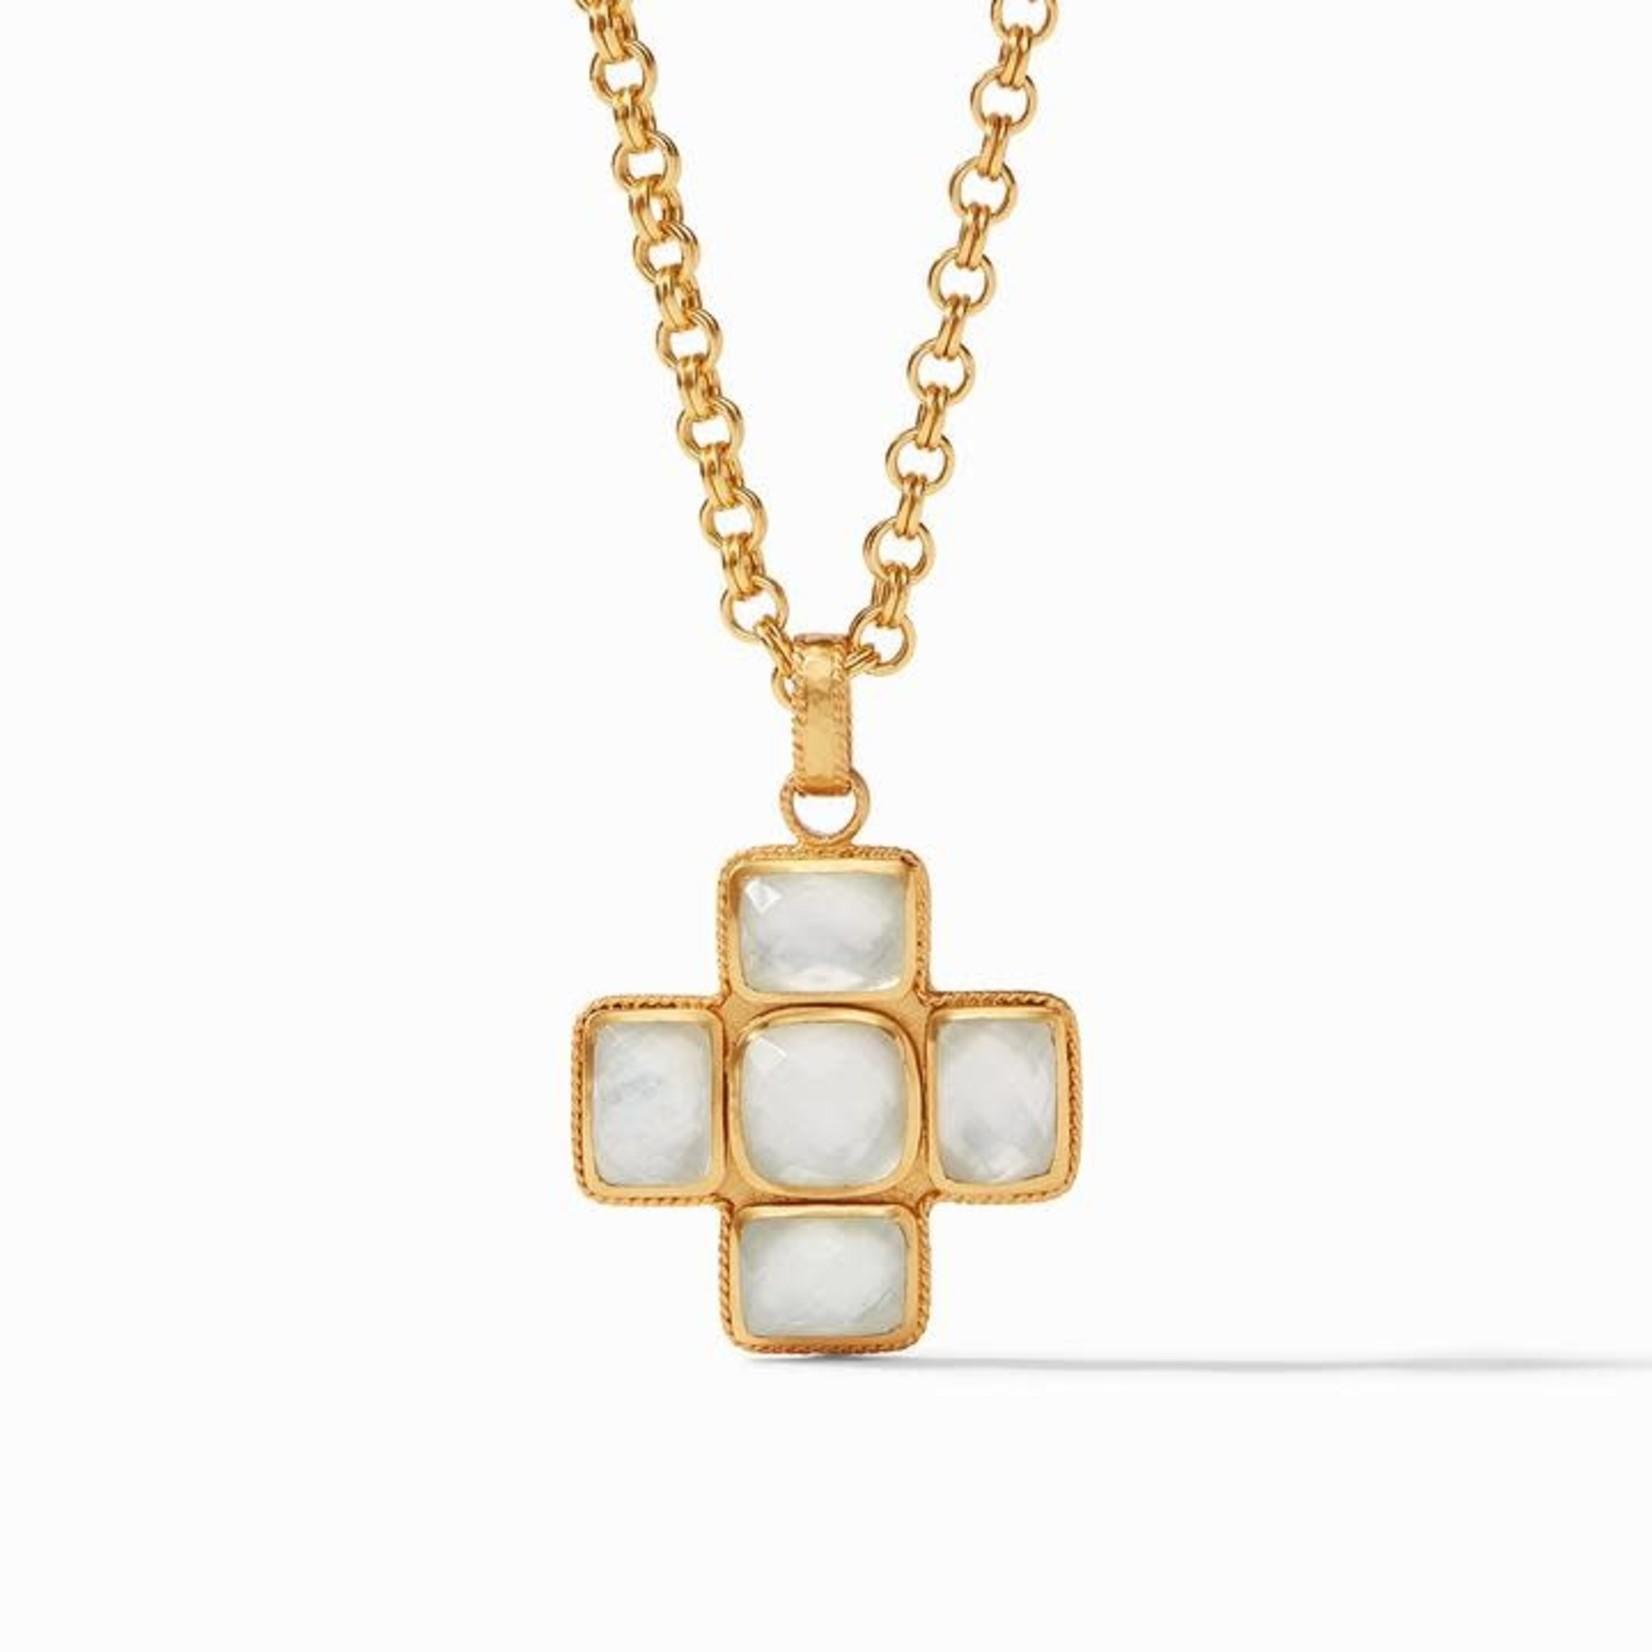 Julie Vos Savoy Pendant - Iridescent Clear Crystal